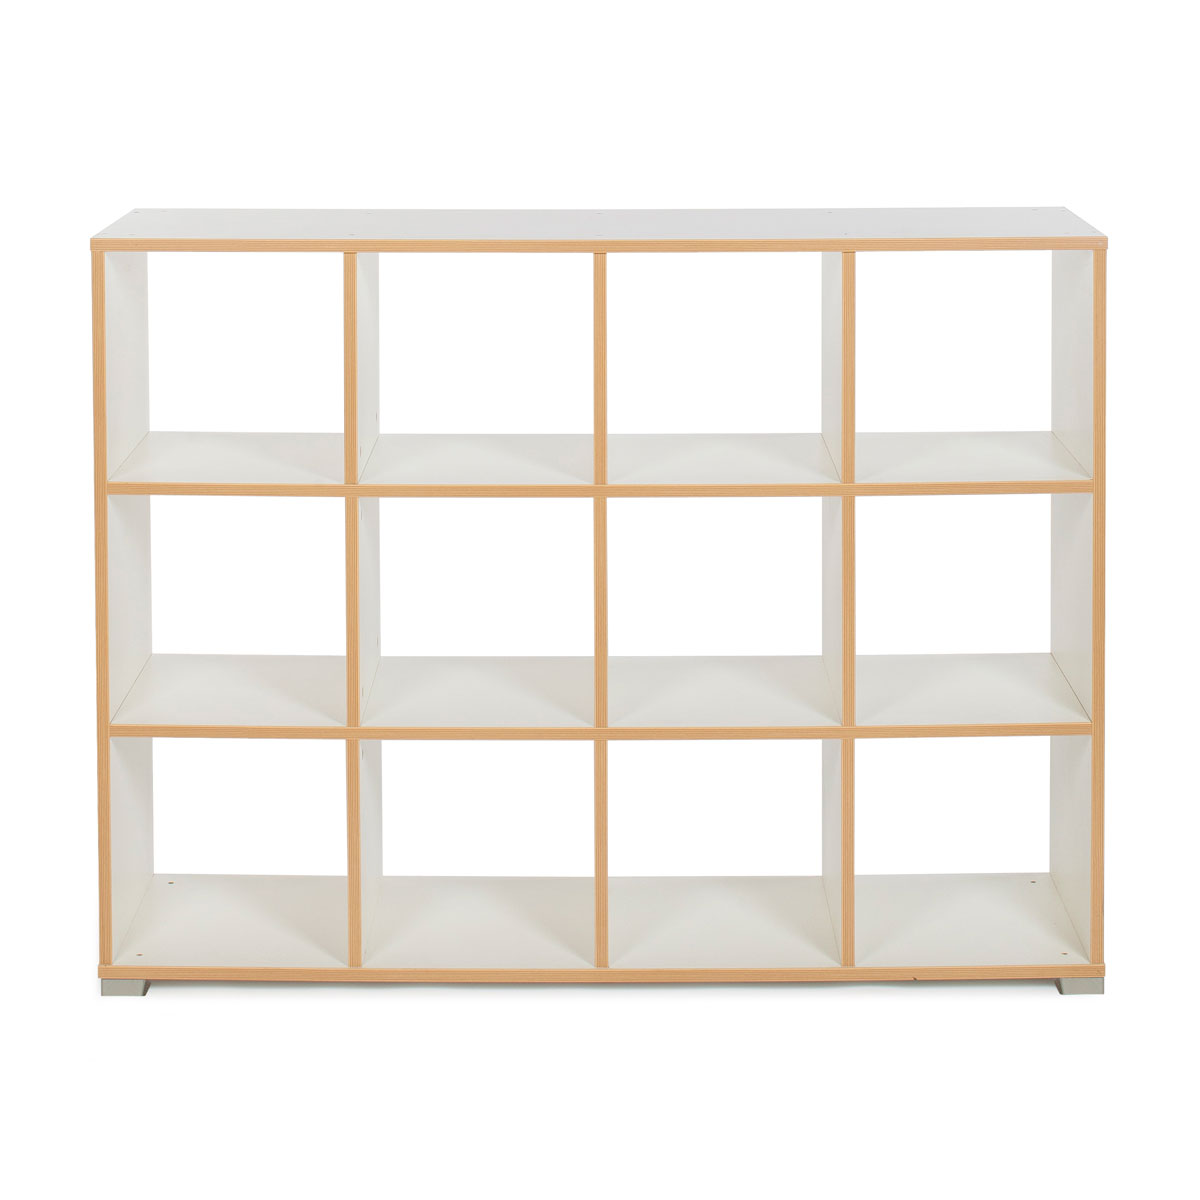 Cube room divider bush furniture ki10 kathy ireland for Ikea backless bookcase